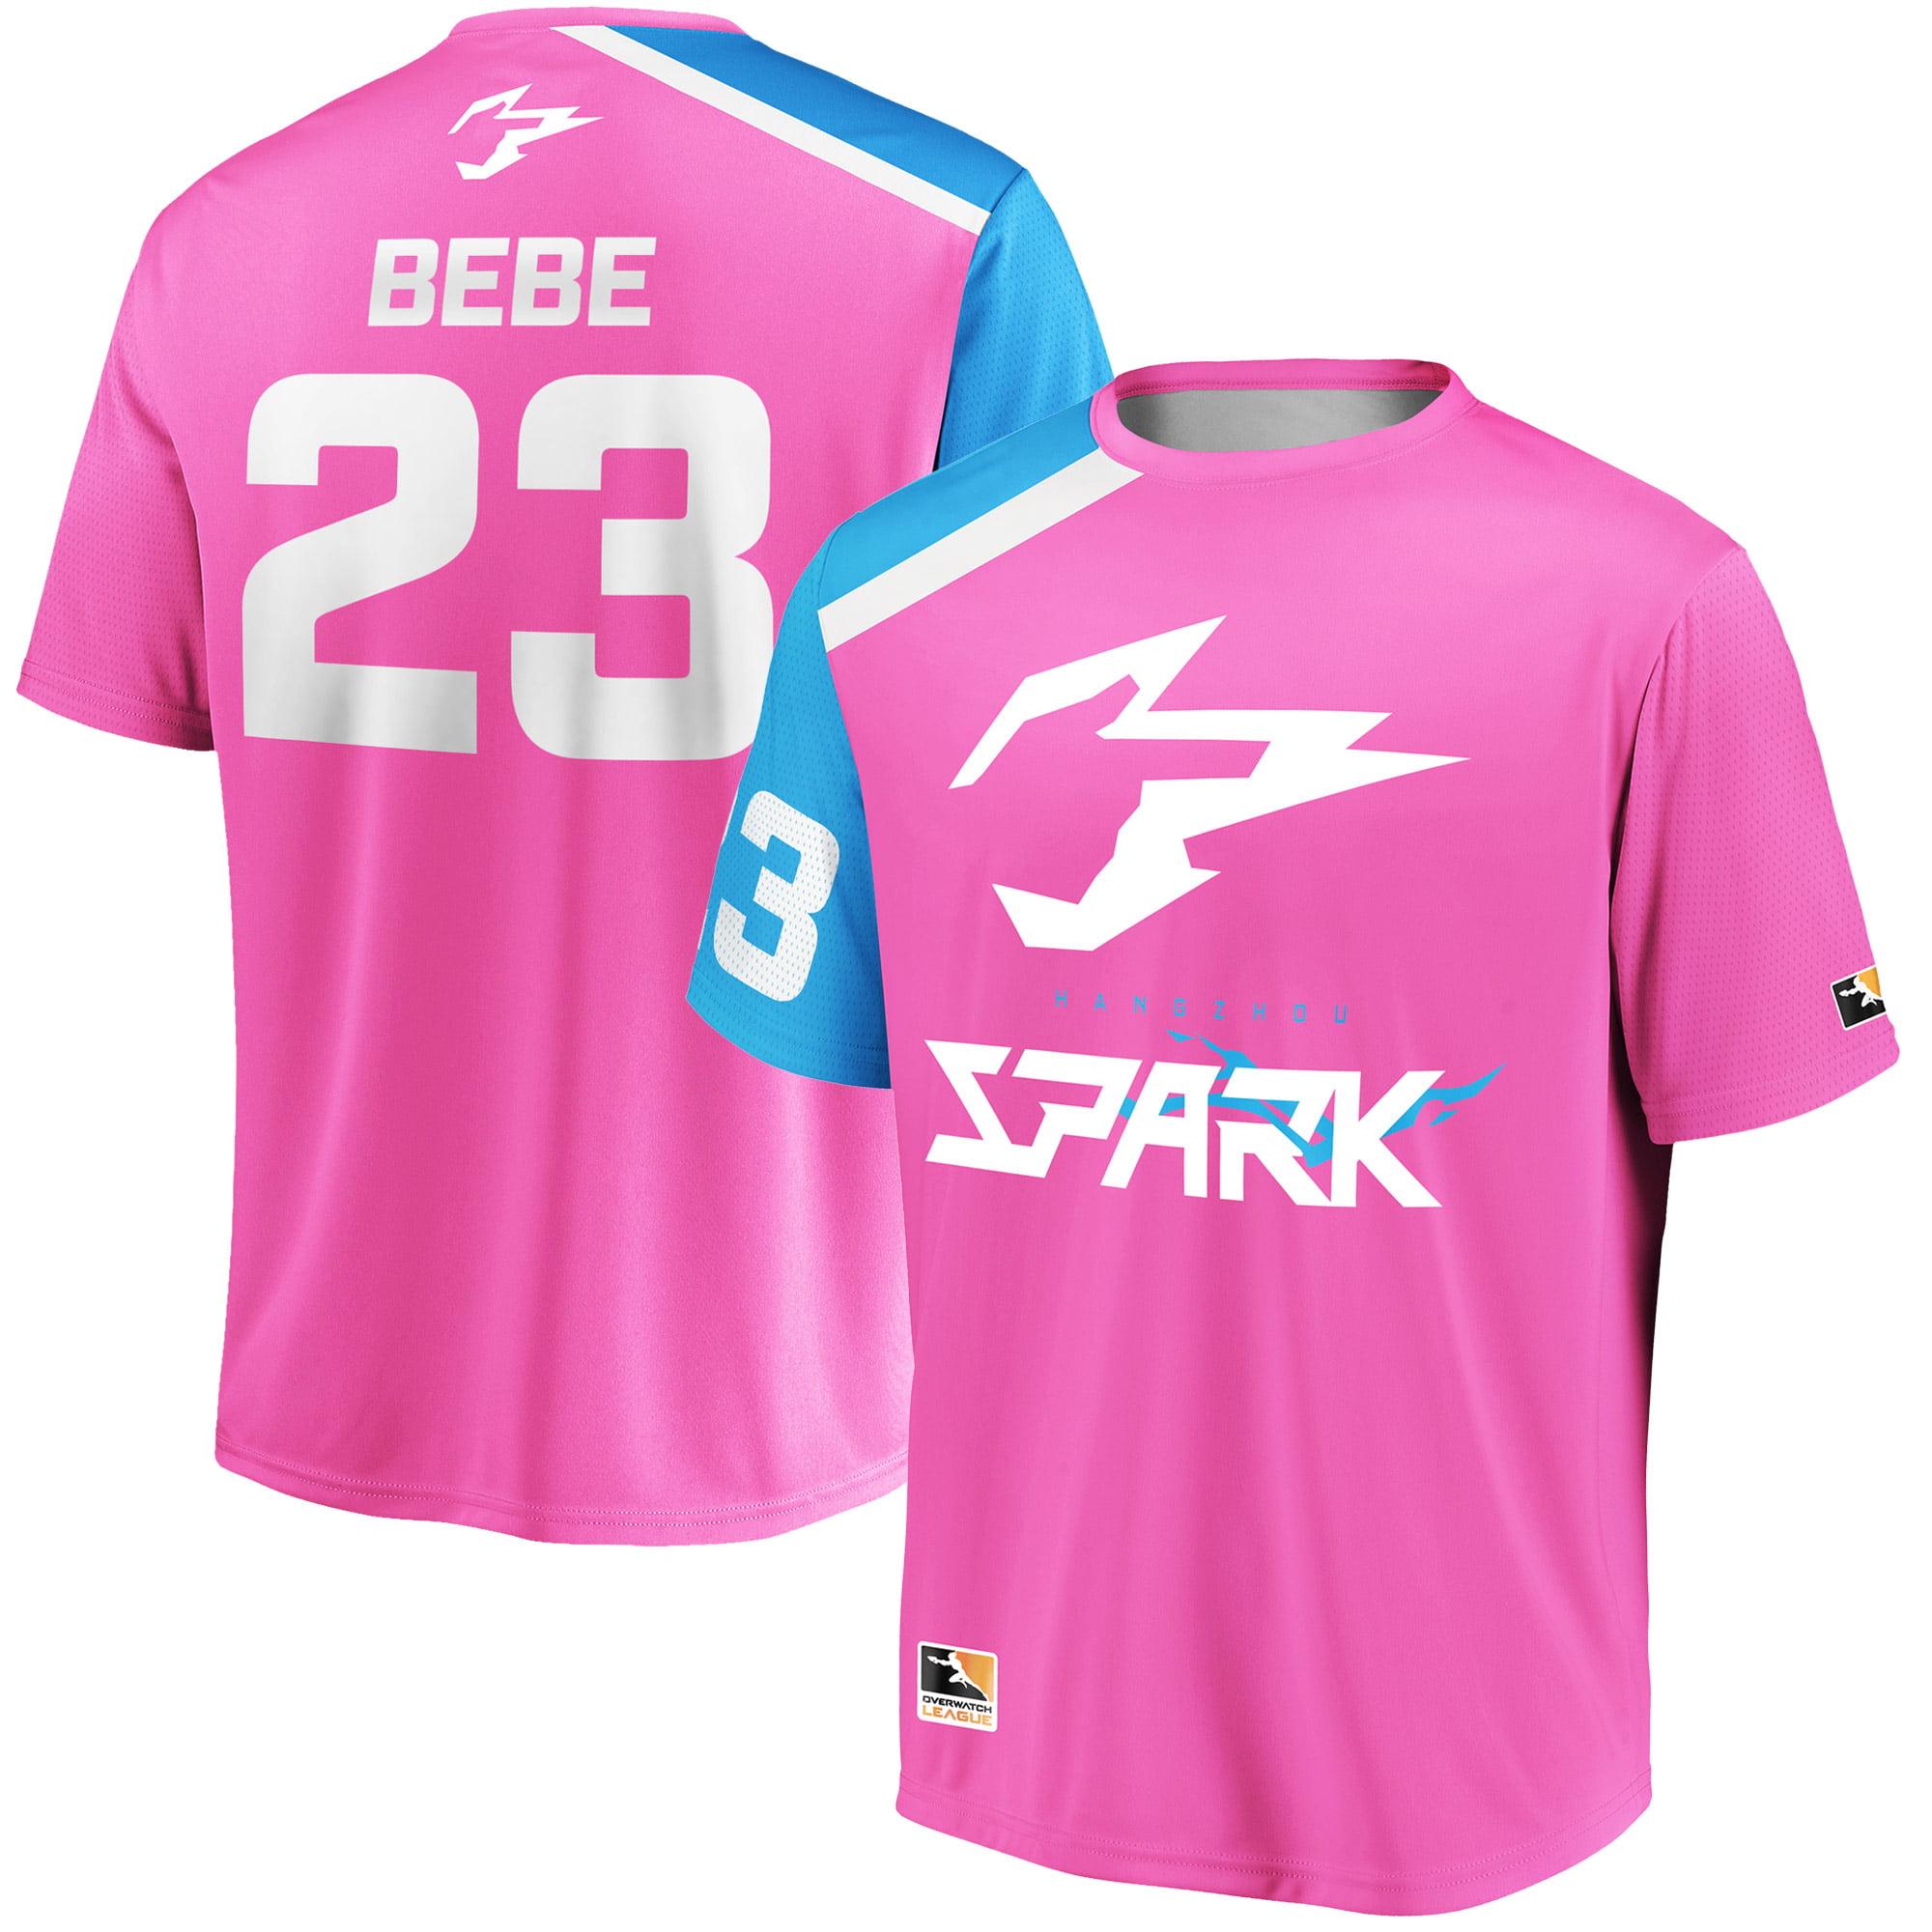 BEBE Hangzhou Spark Overwatch League Replica Home Jersey - Pink